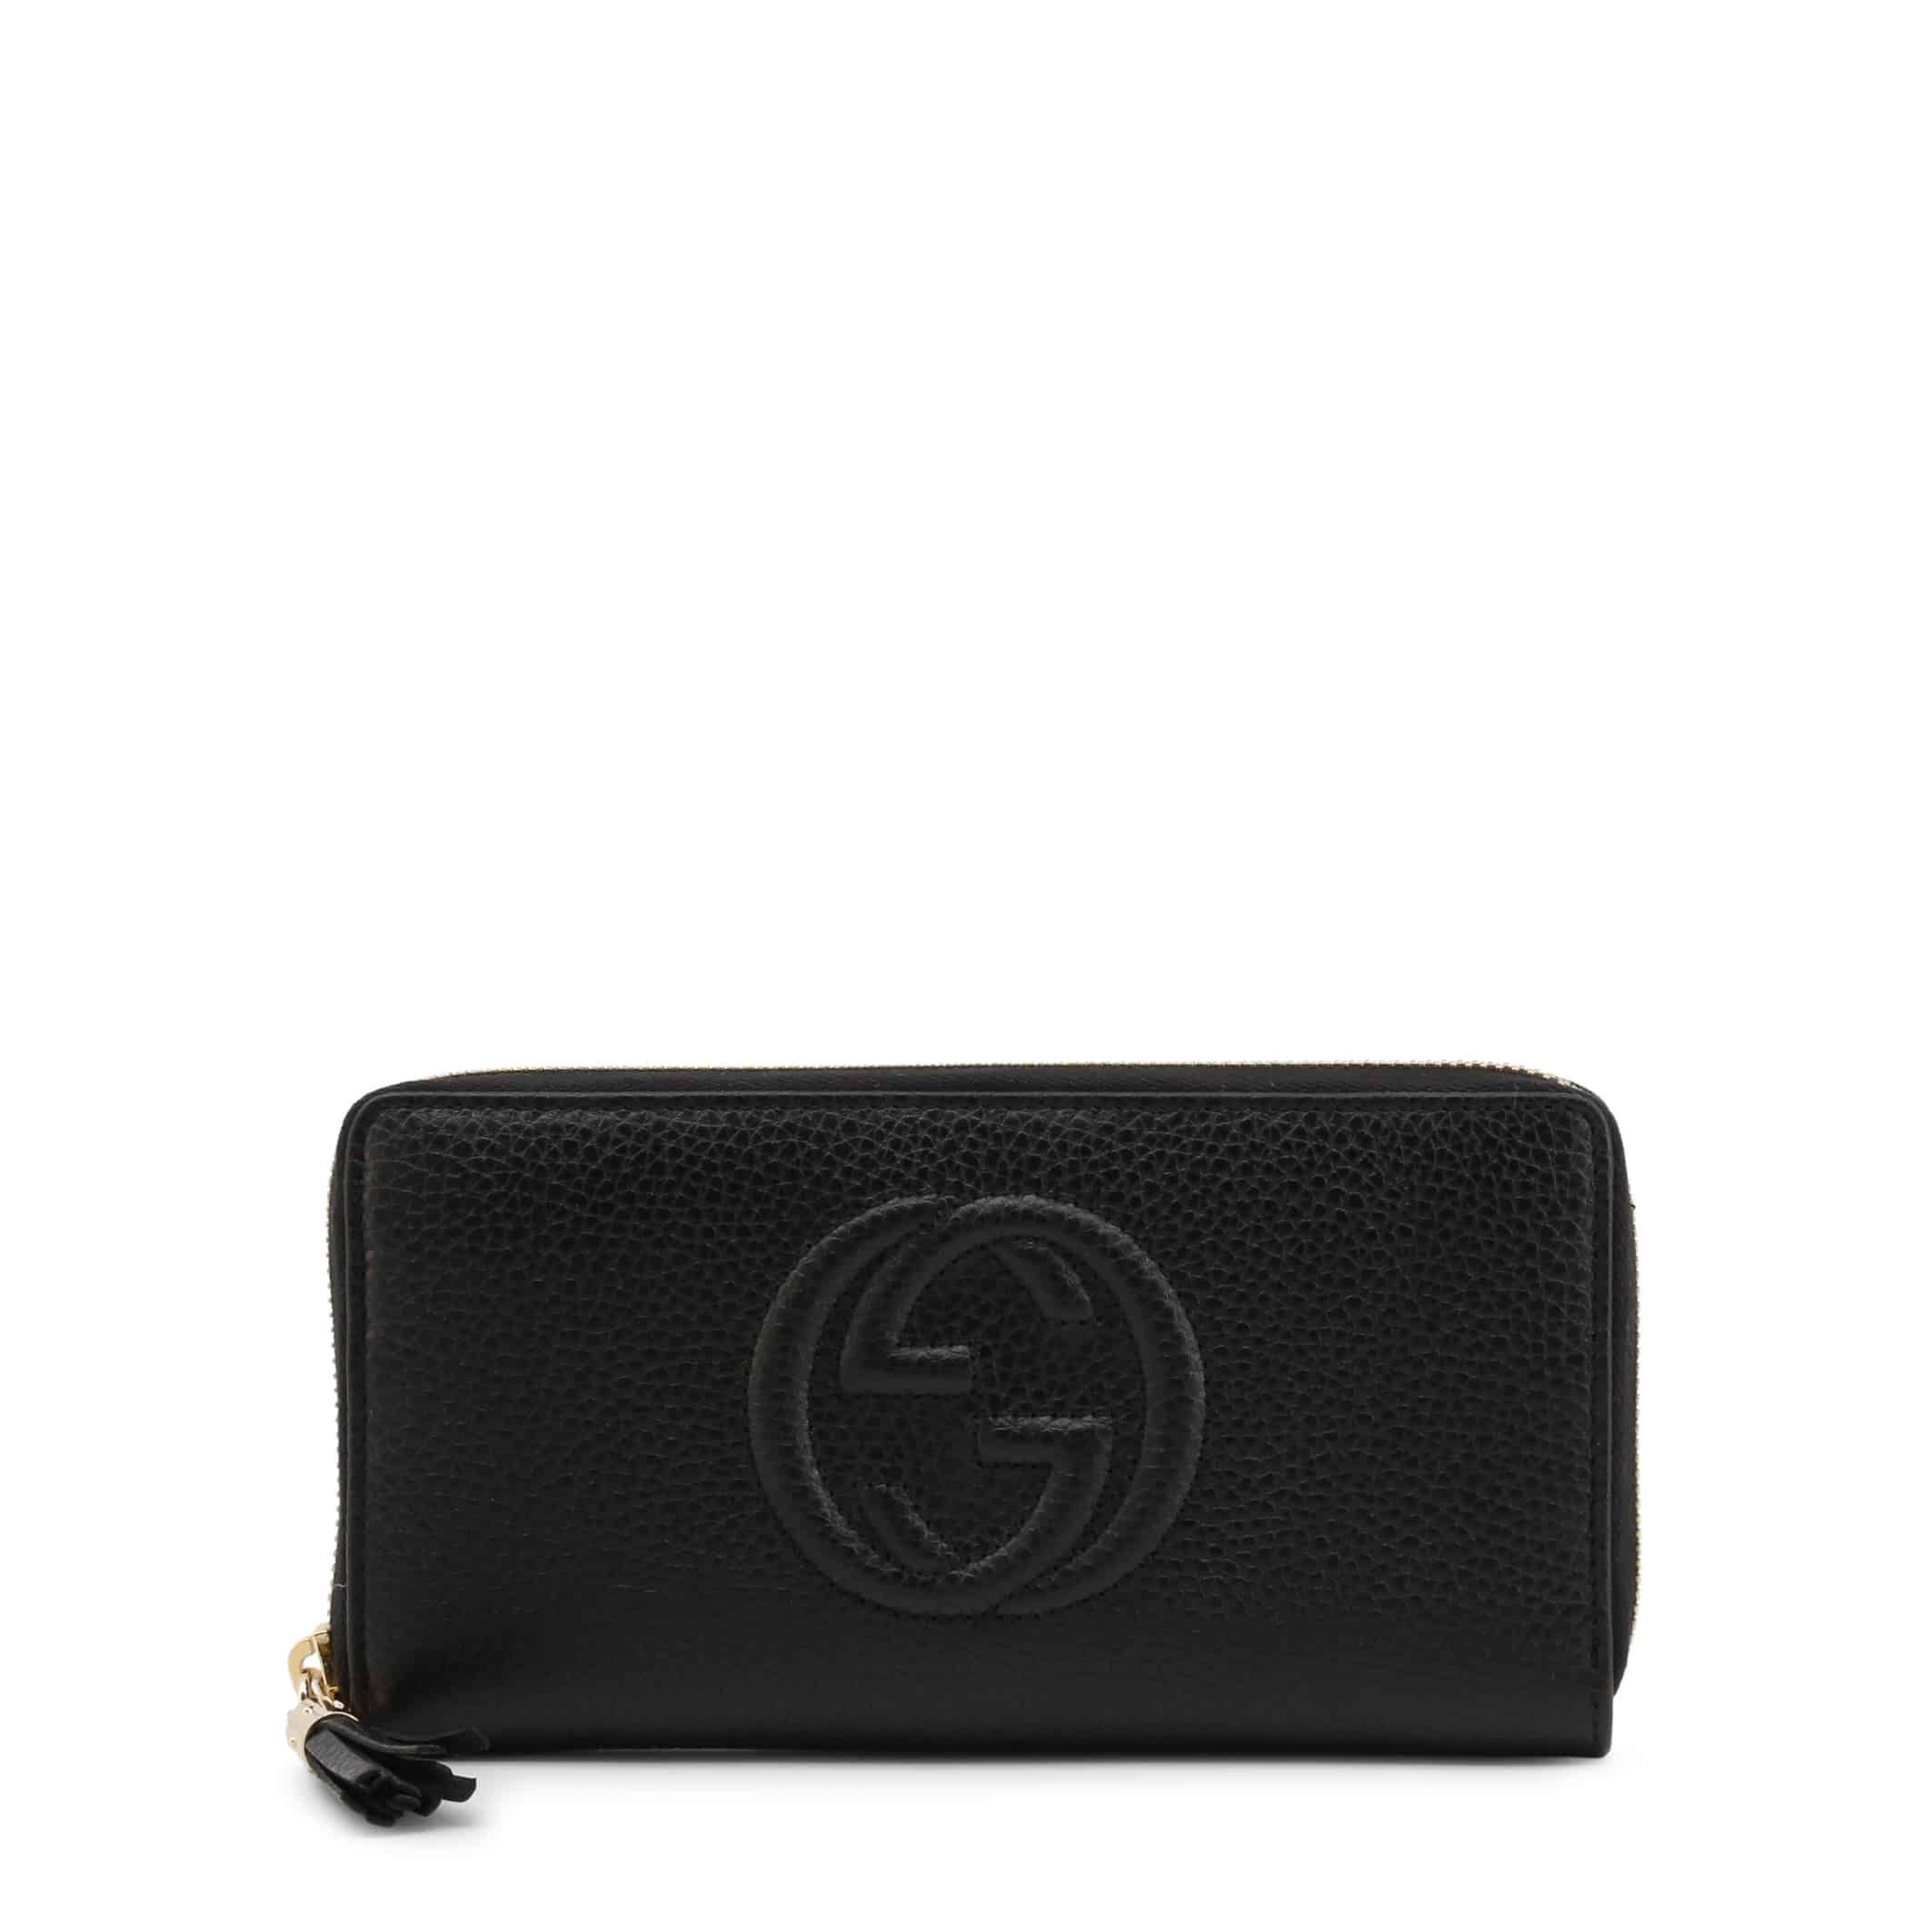 Gucci – 598187_A7M0G – Negro